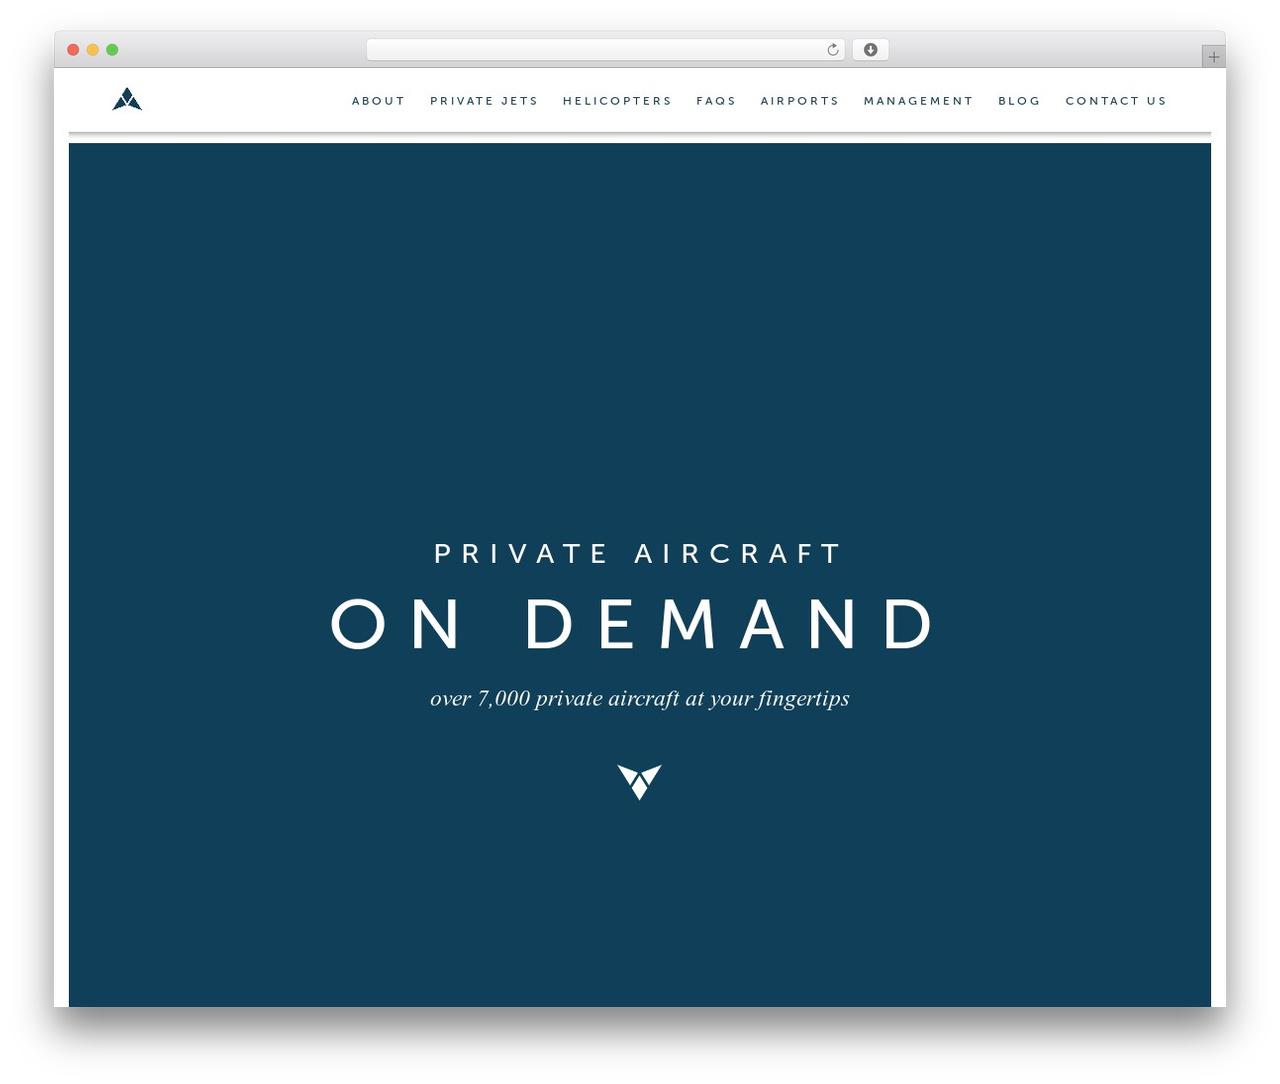 WordPress theme Avion - flyavion.com